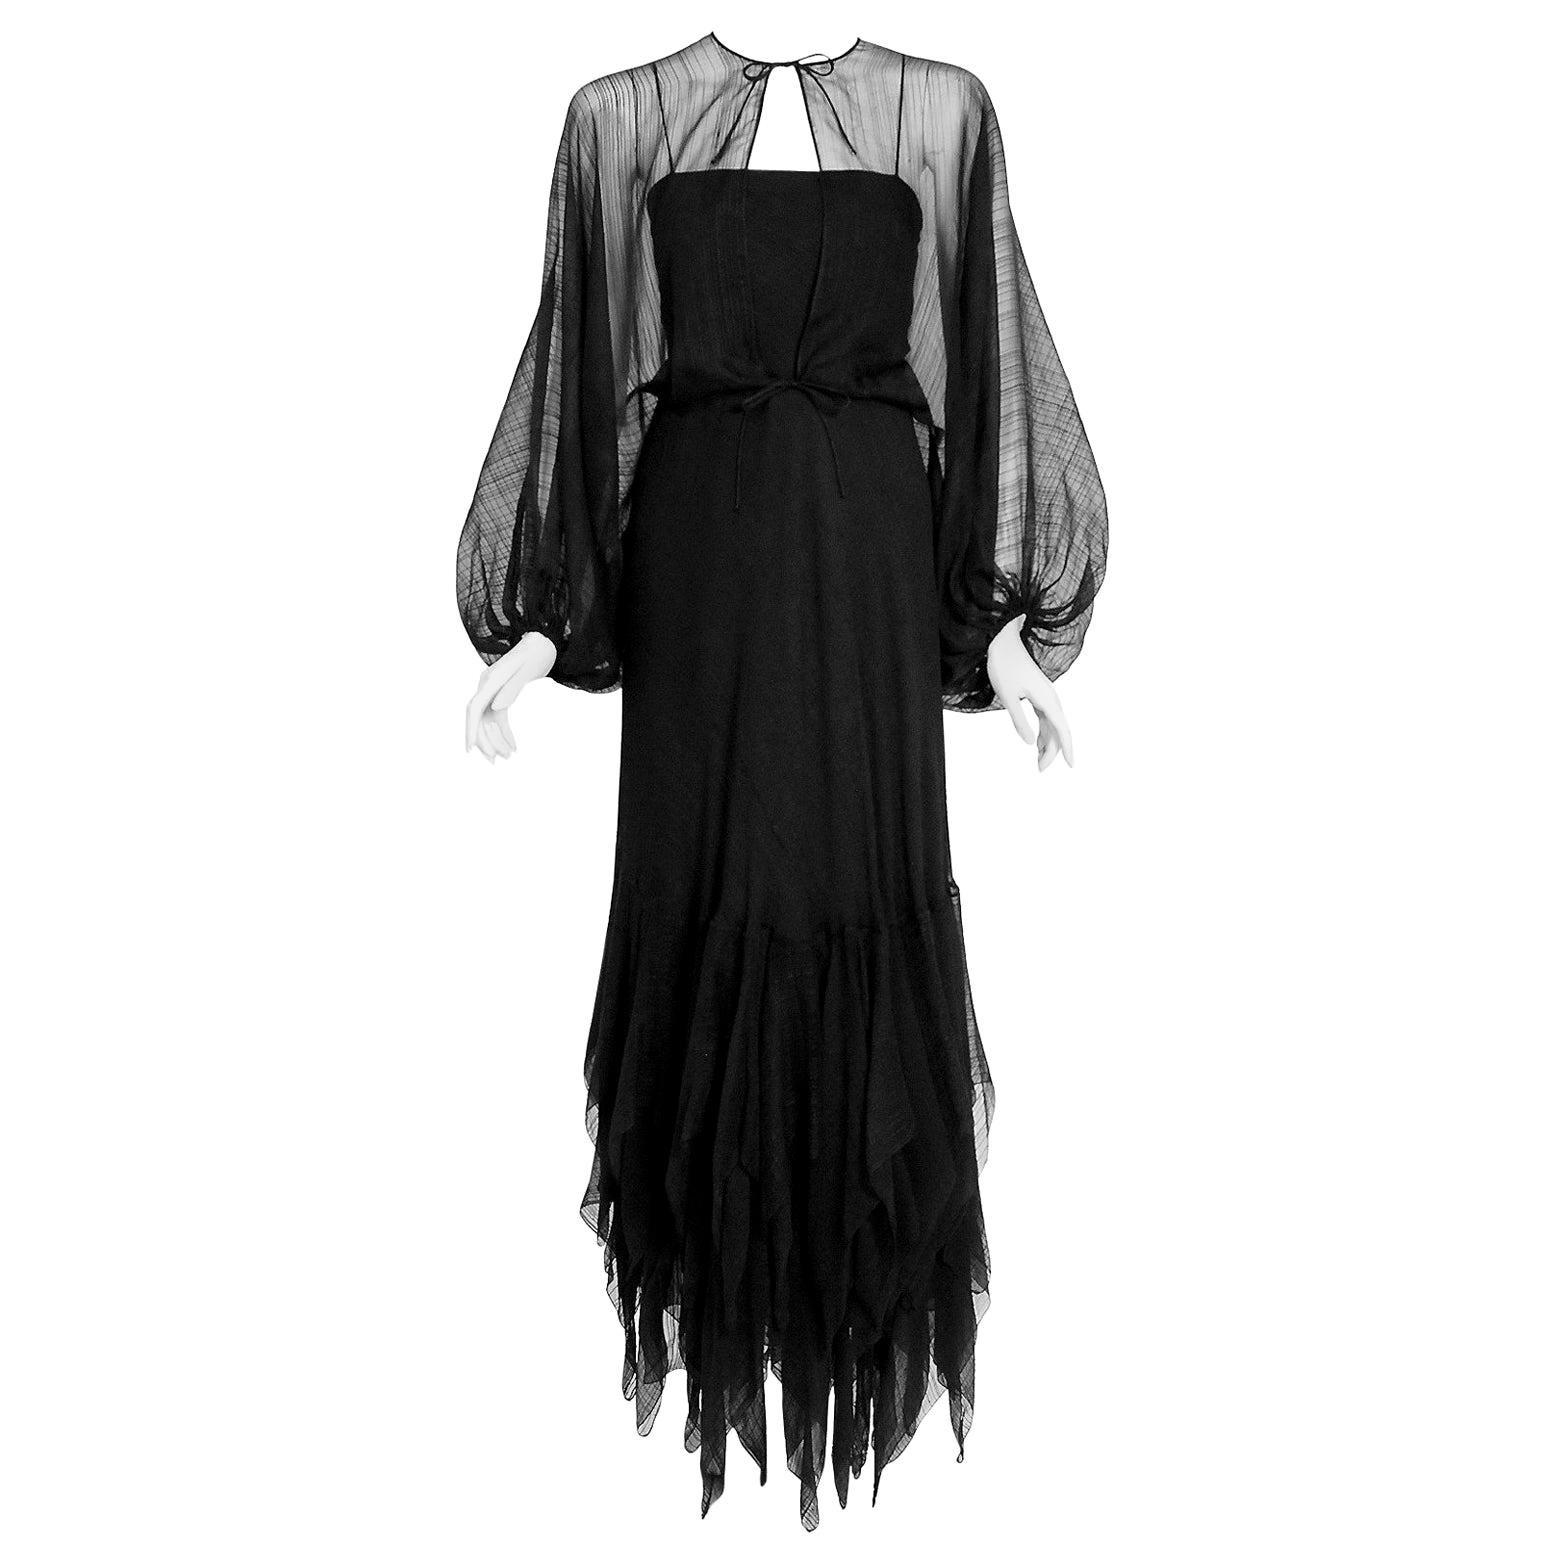 Vintage 1976 Stavropoulos Black Sheer Silk Carwash Gown & Billow-Sleeve Jacket